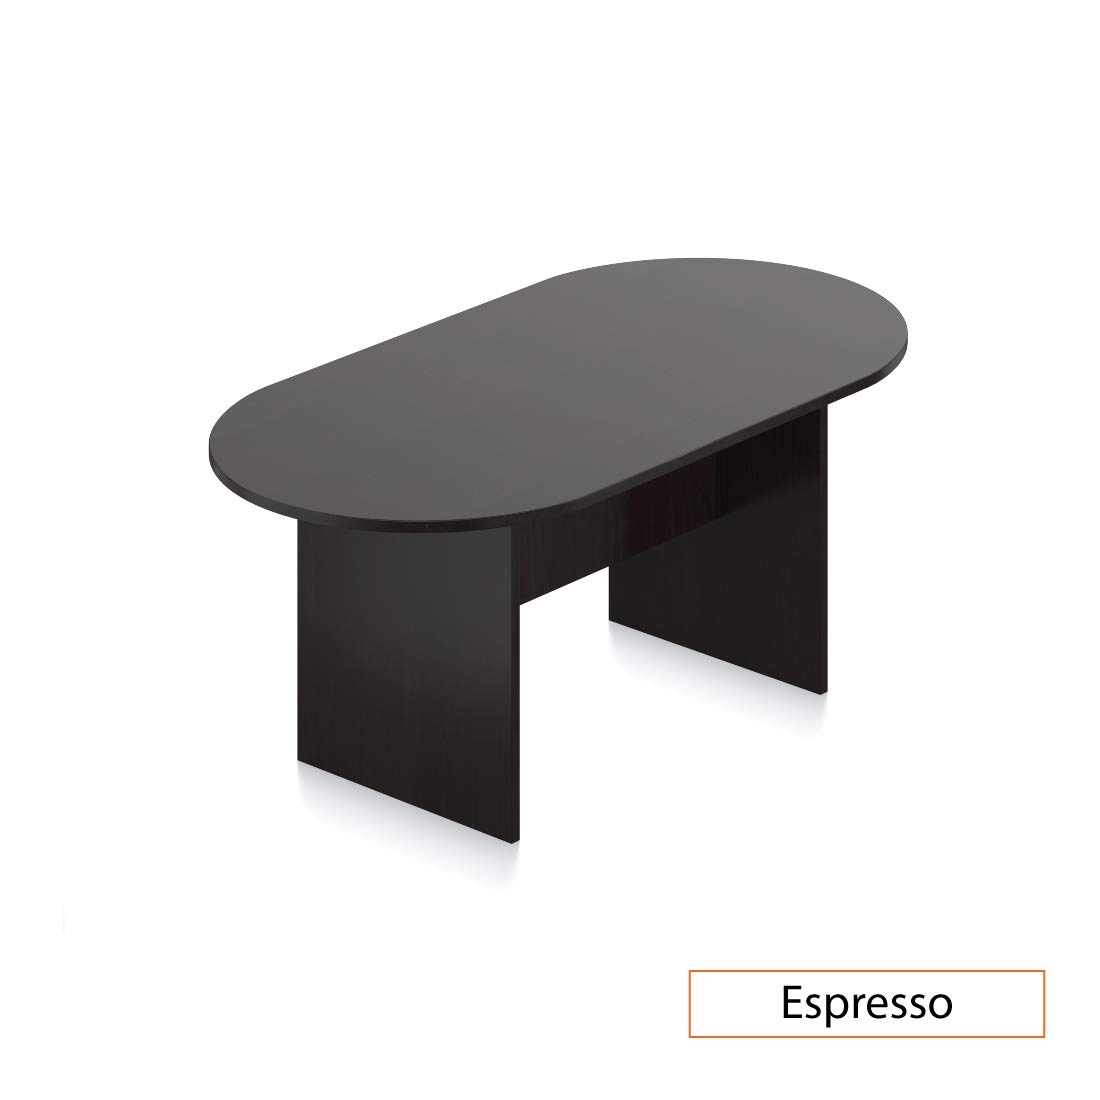 GOF 6 FT Conference Table, Cherry, Espresso, Mahogany, Walnut (6FT, Espresso)